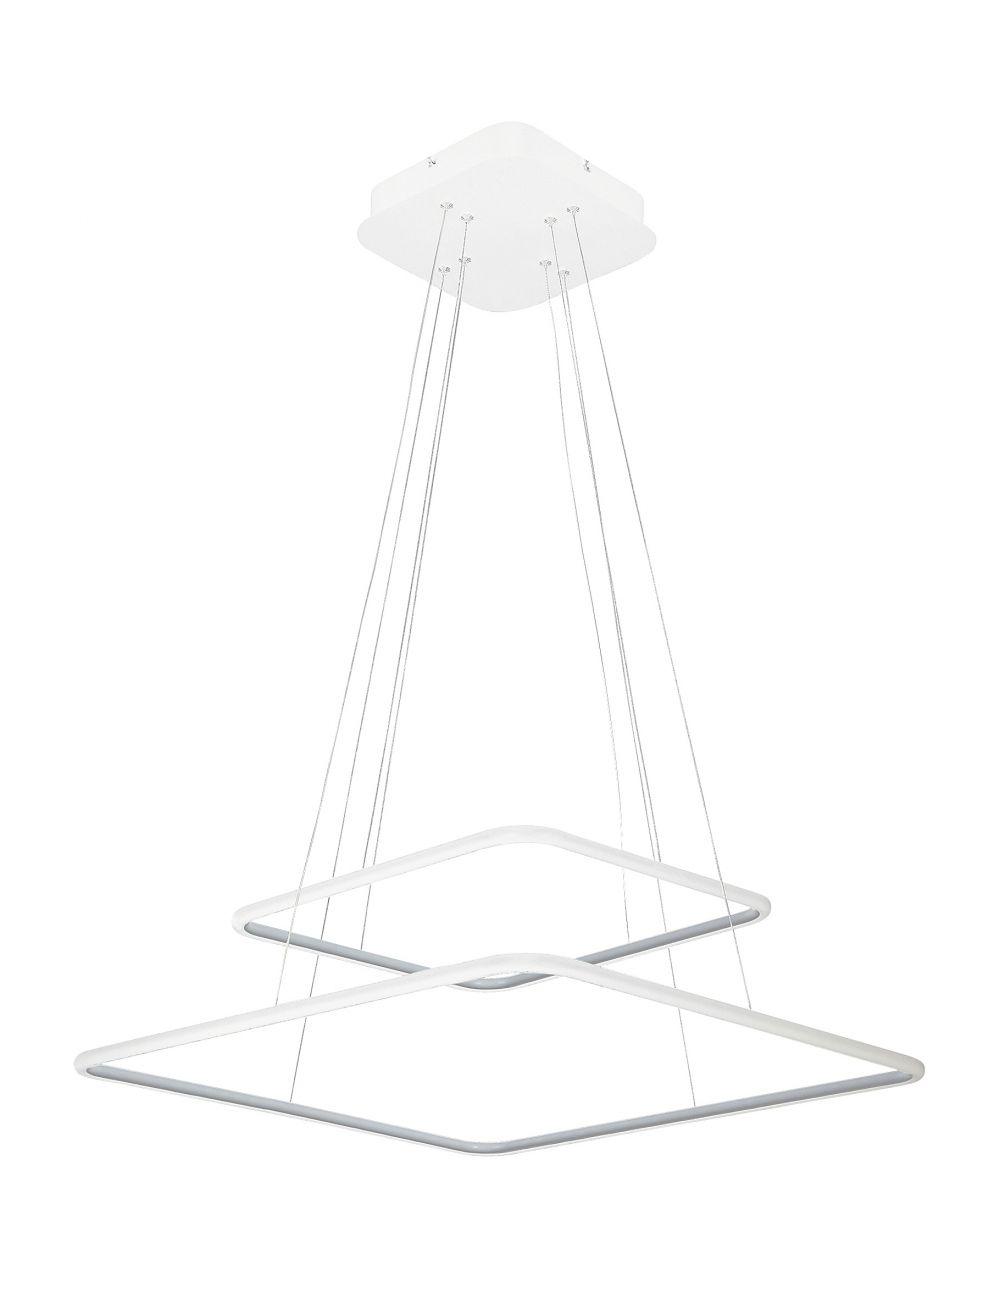 Nowoczesna lampa wisząca ledowa ring kwadratowa biała Donatella Rabalux 2546